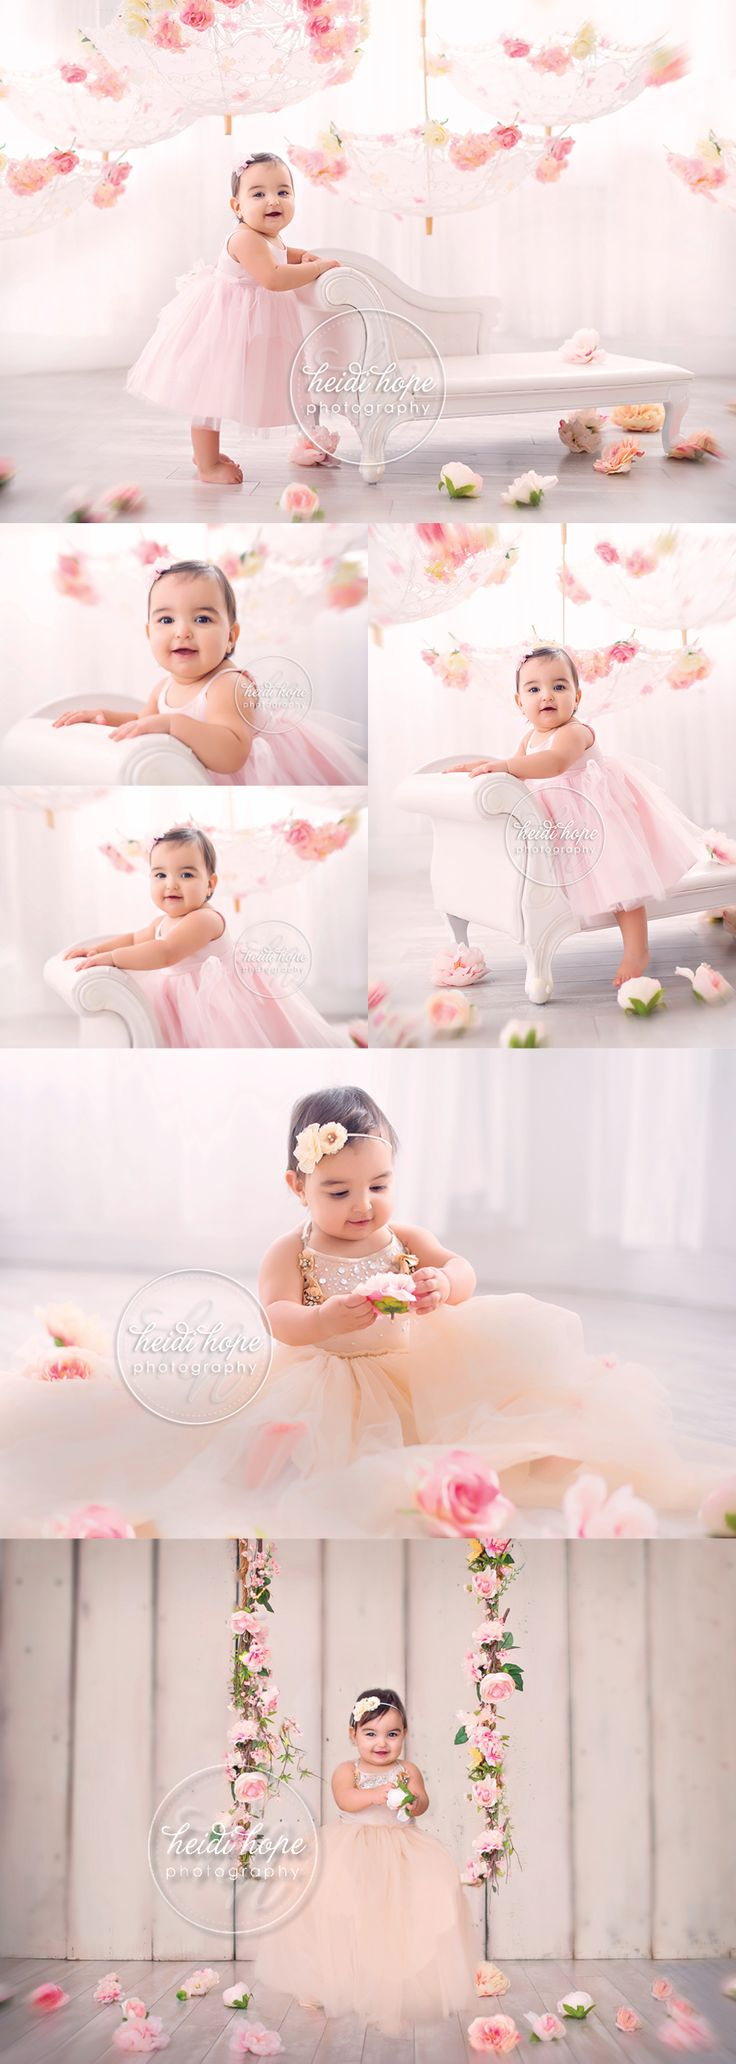 First Birthday | Floral | TuTu| Girly | Blog | Heidi Hope Photography